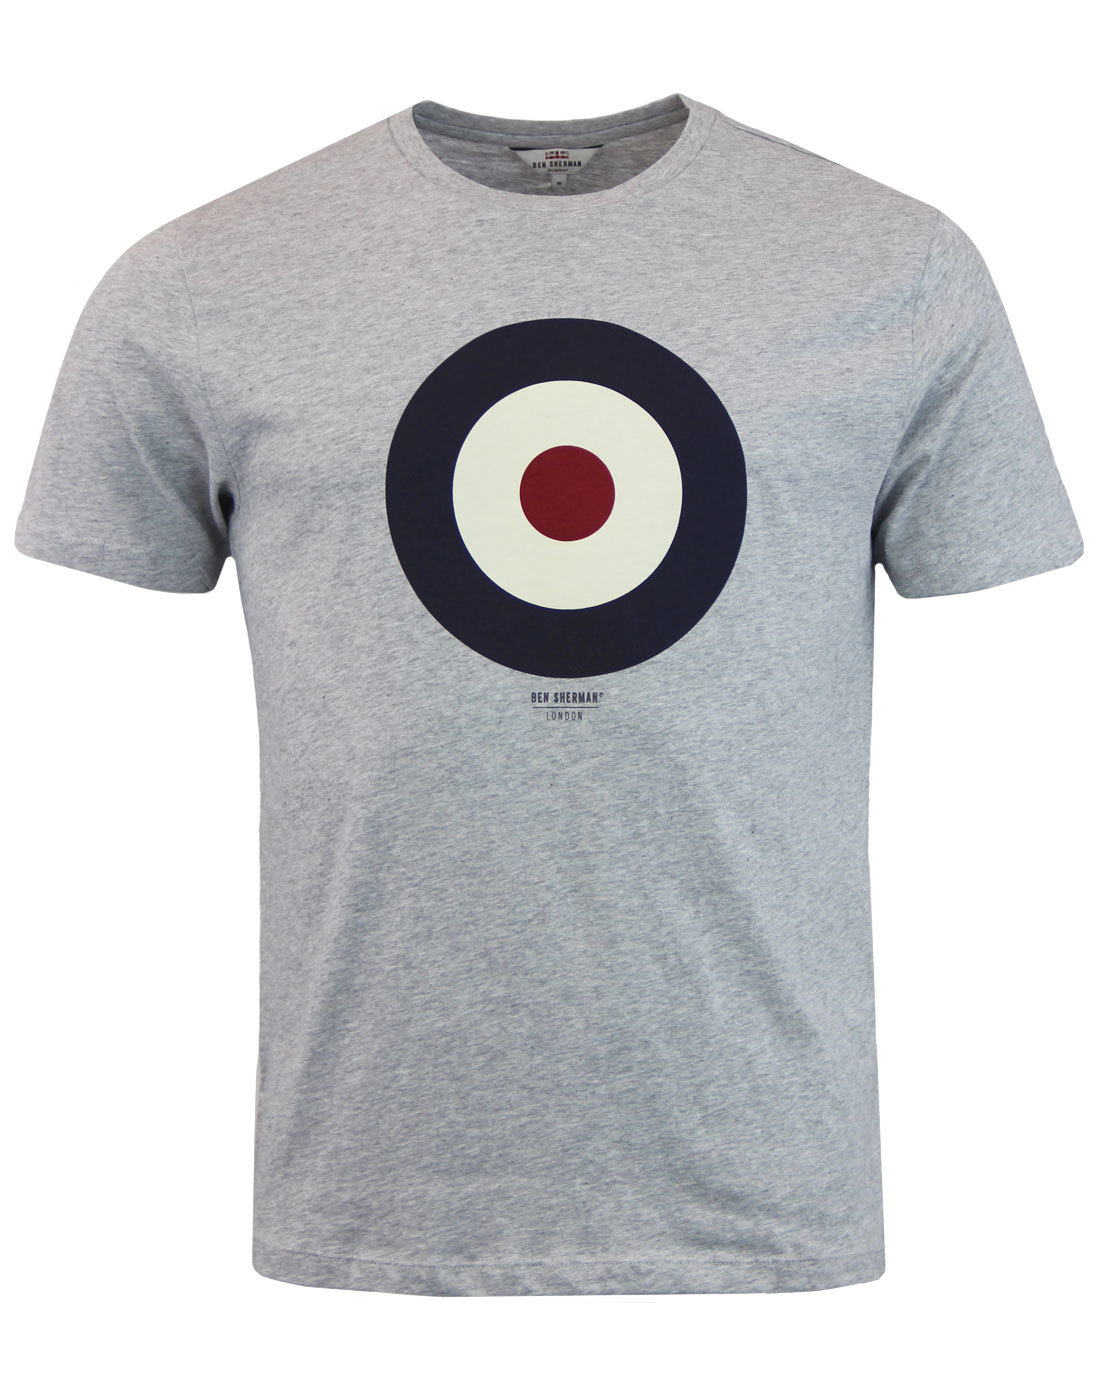 BEN SHERMAN Keith Moon Mod Target T-Shirt GREY